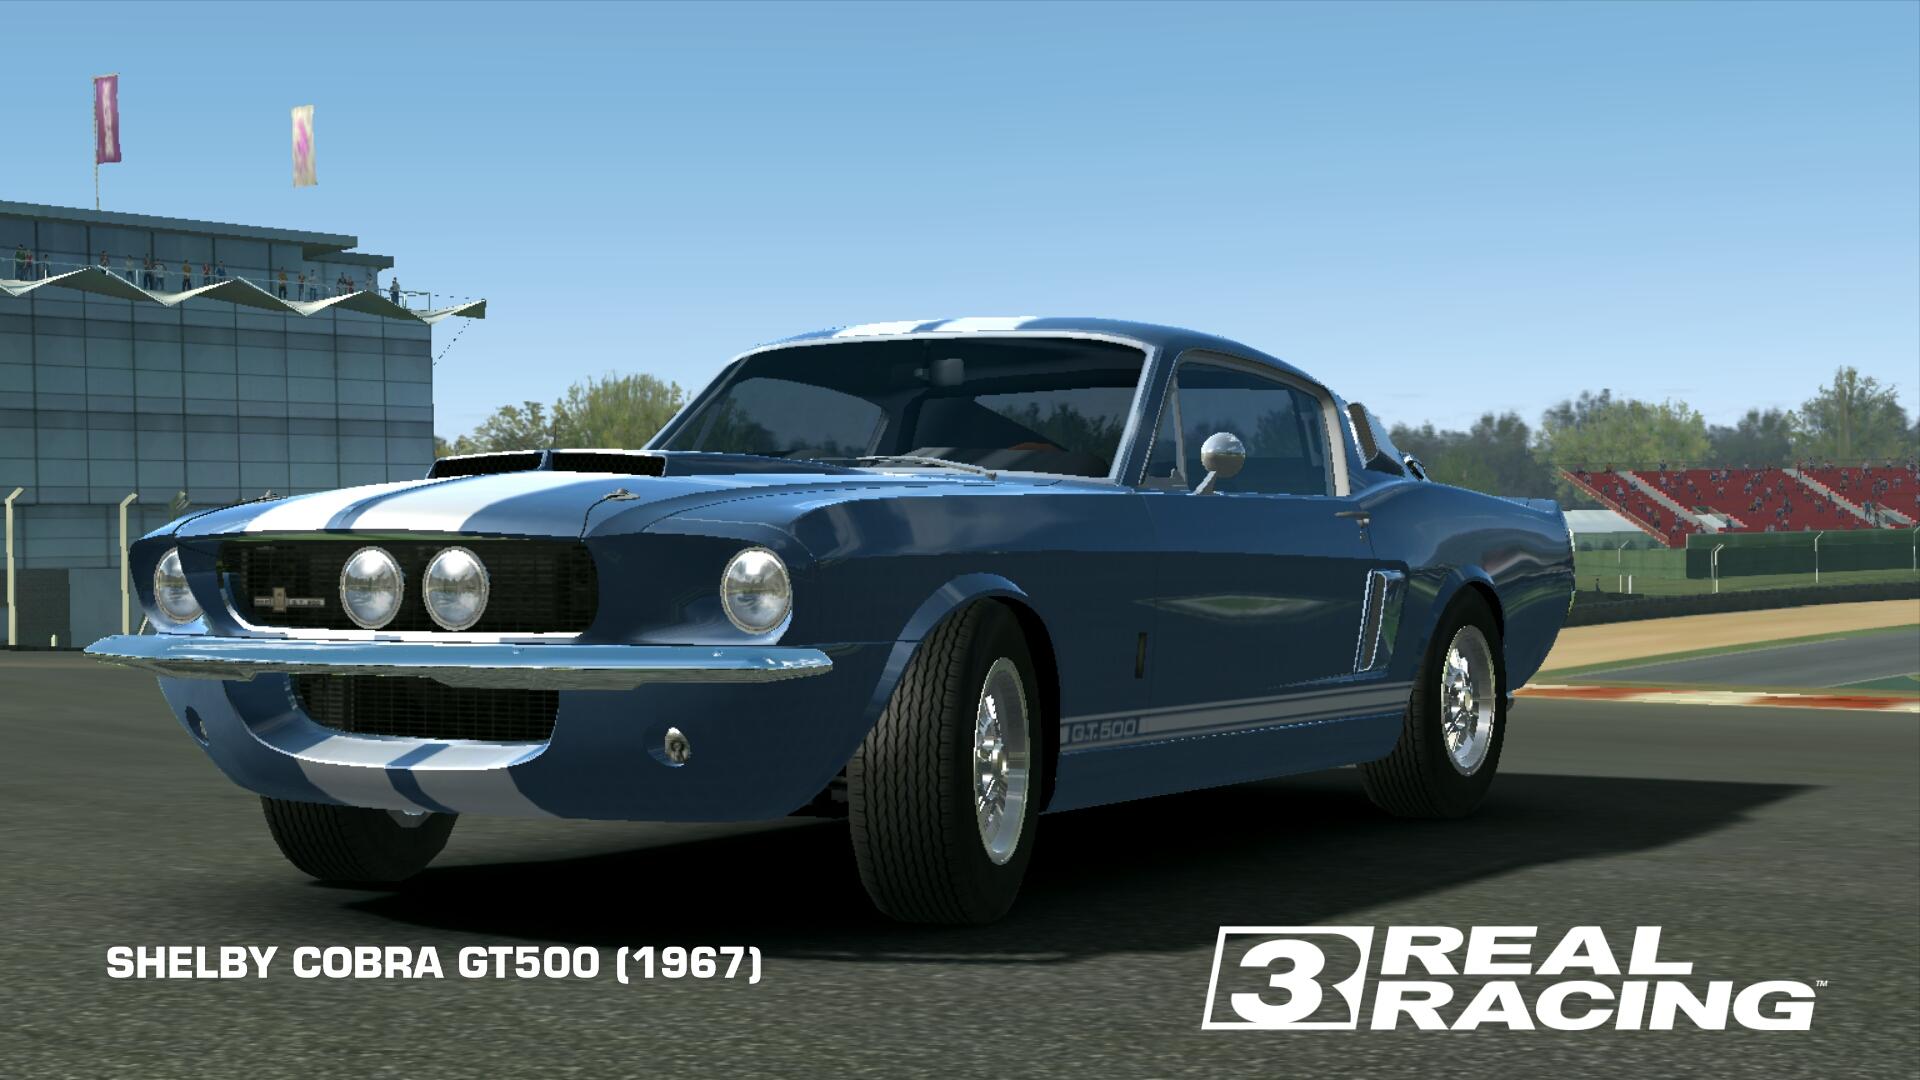 Cobra gt500 1967